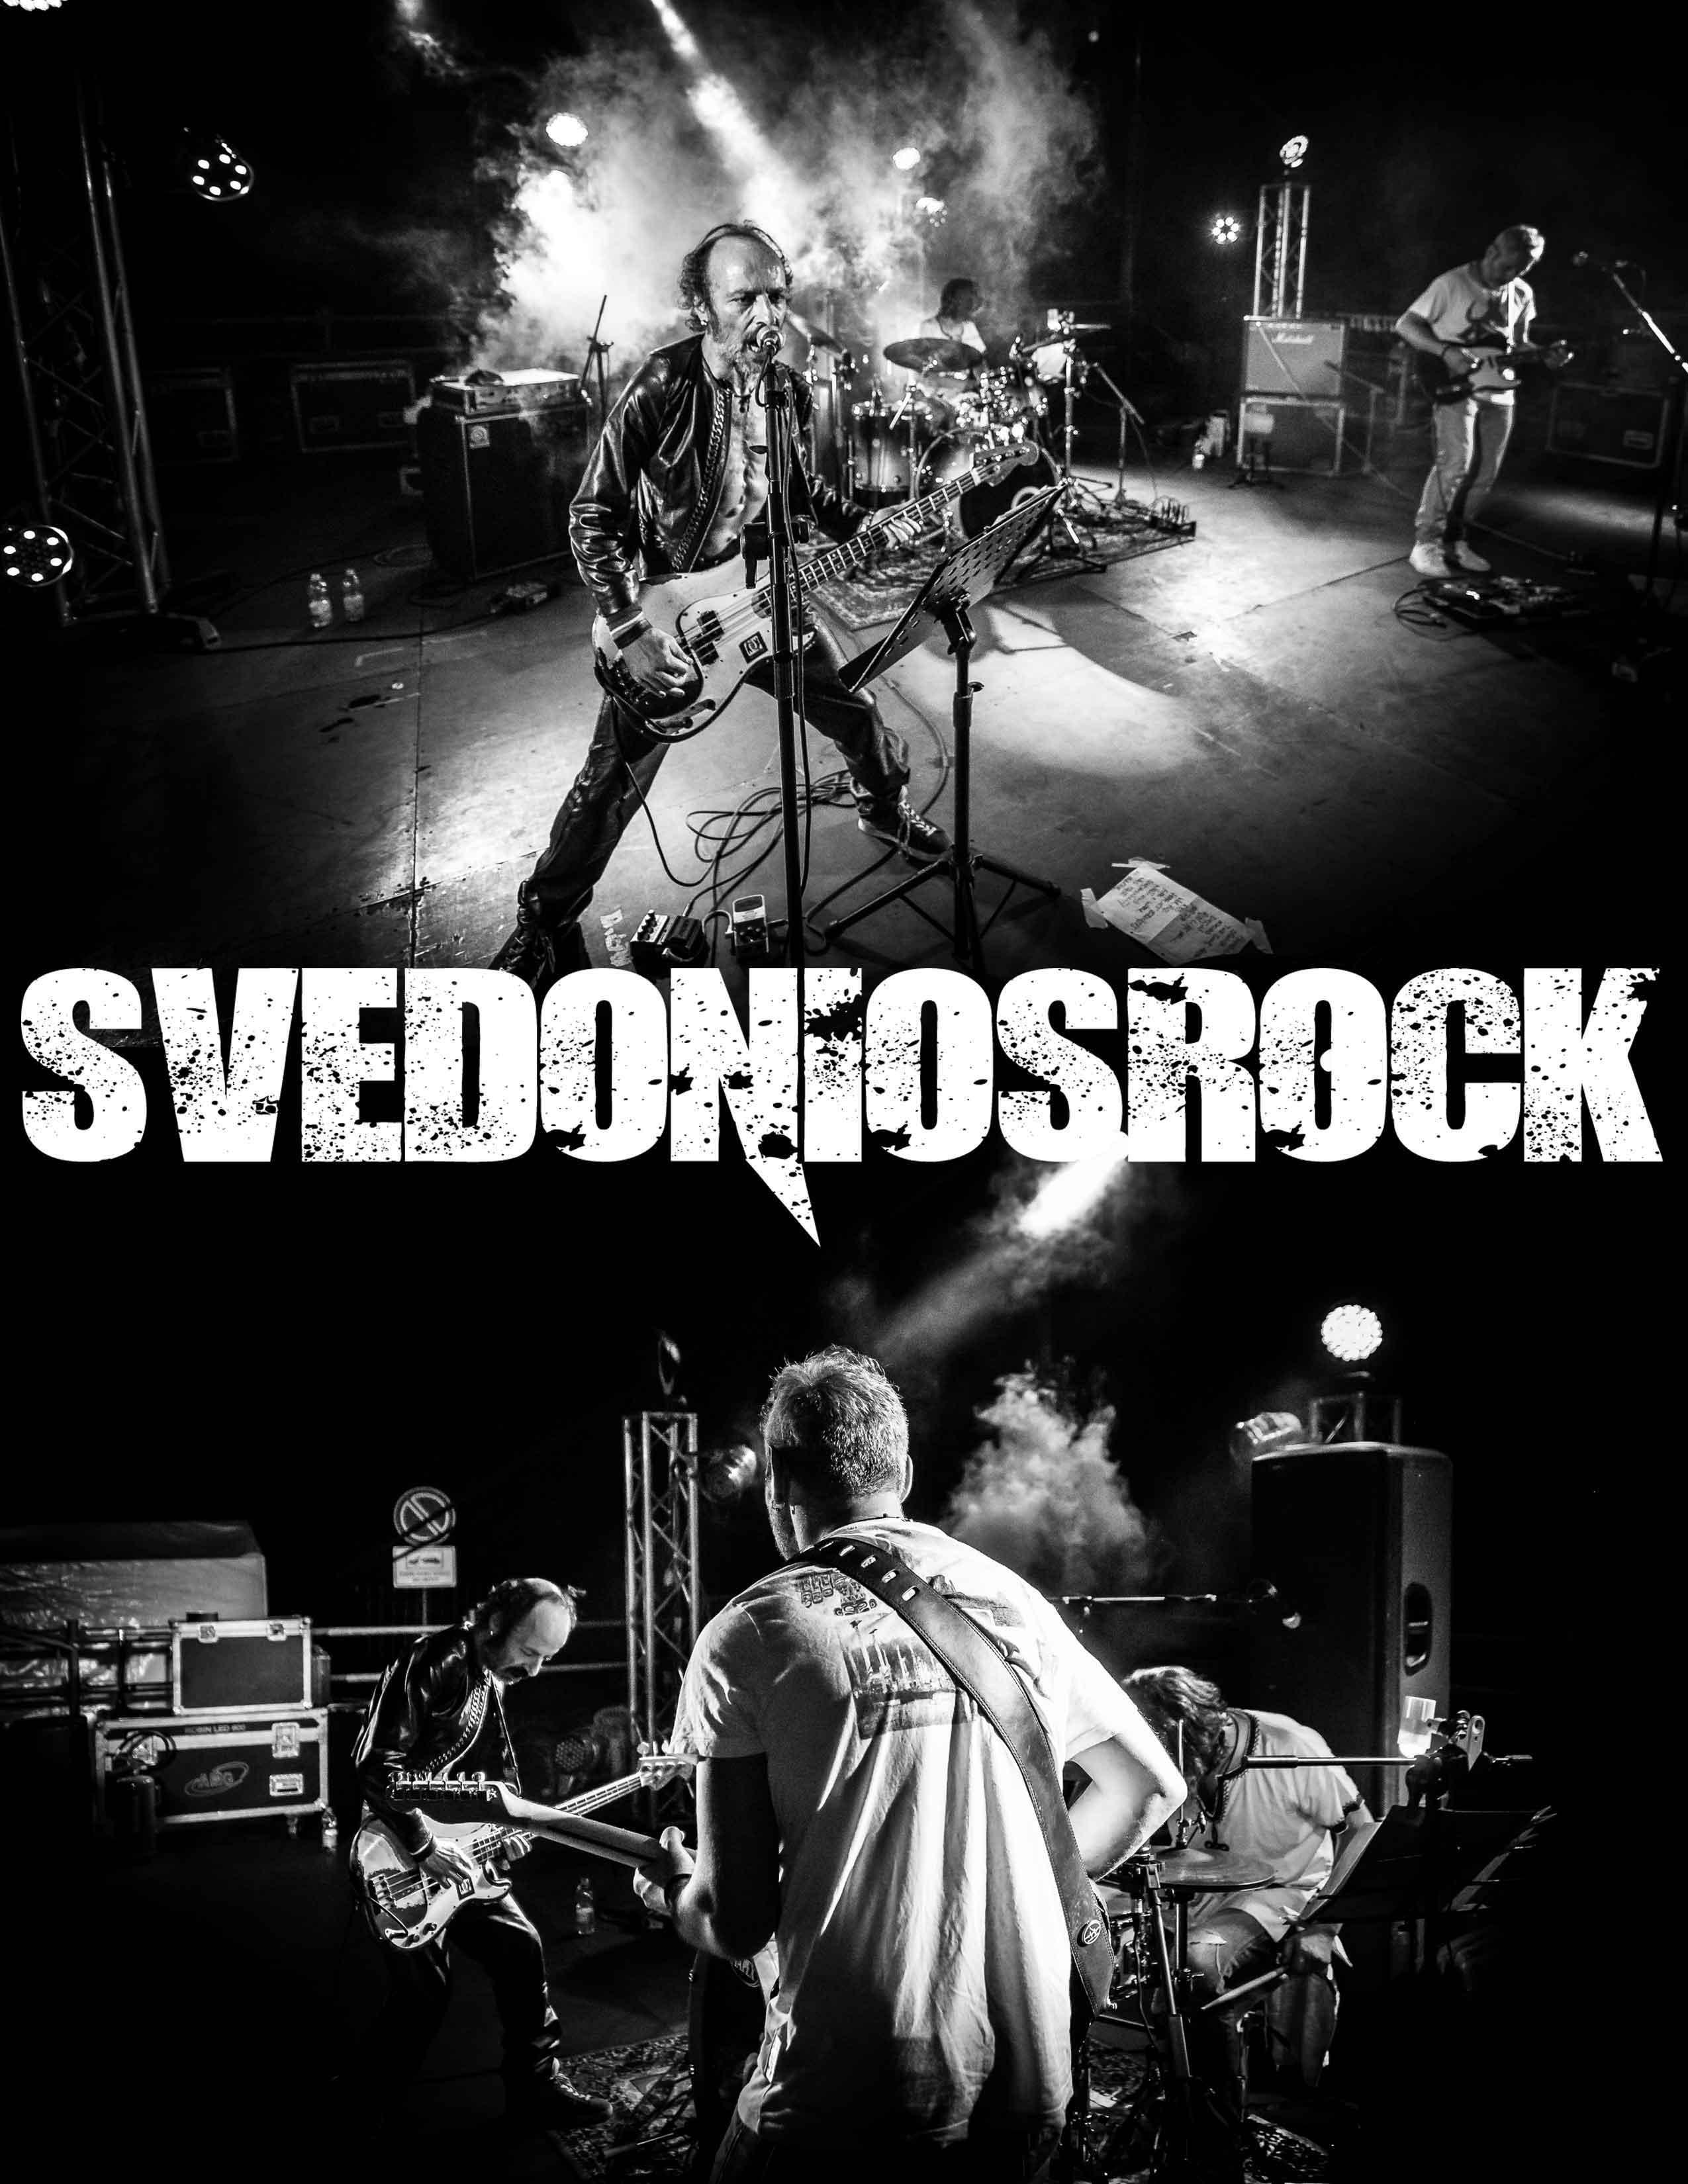 svedoniosrock trio rock Orvieto